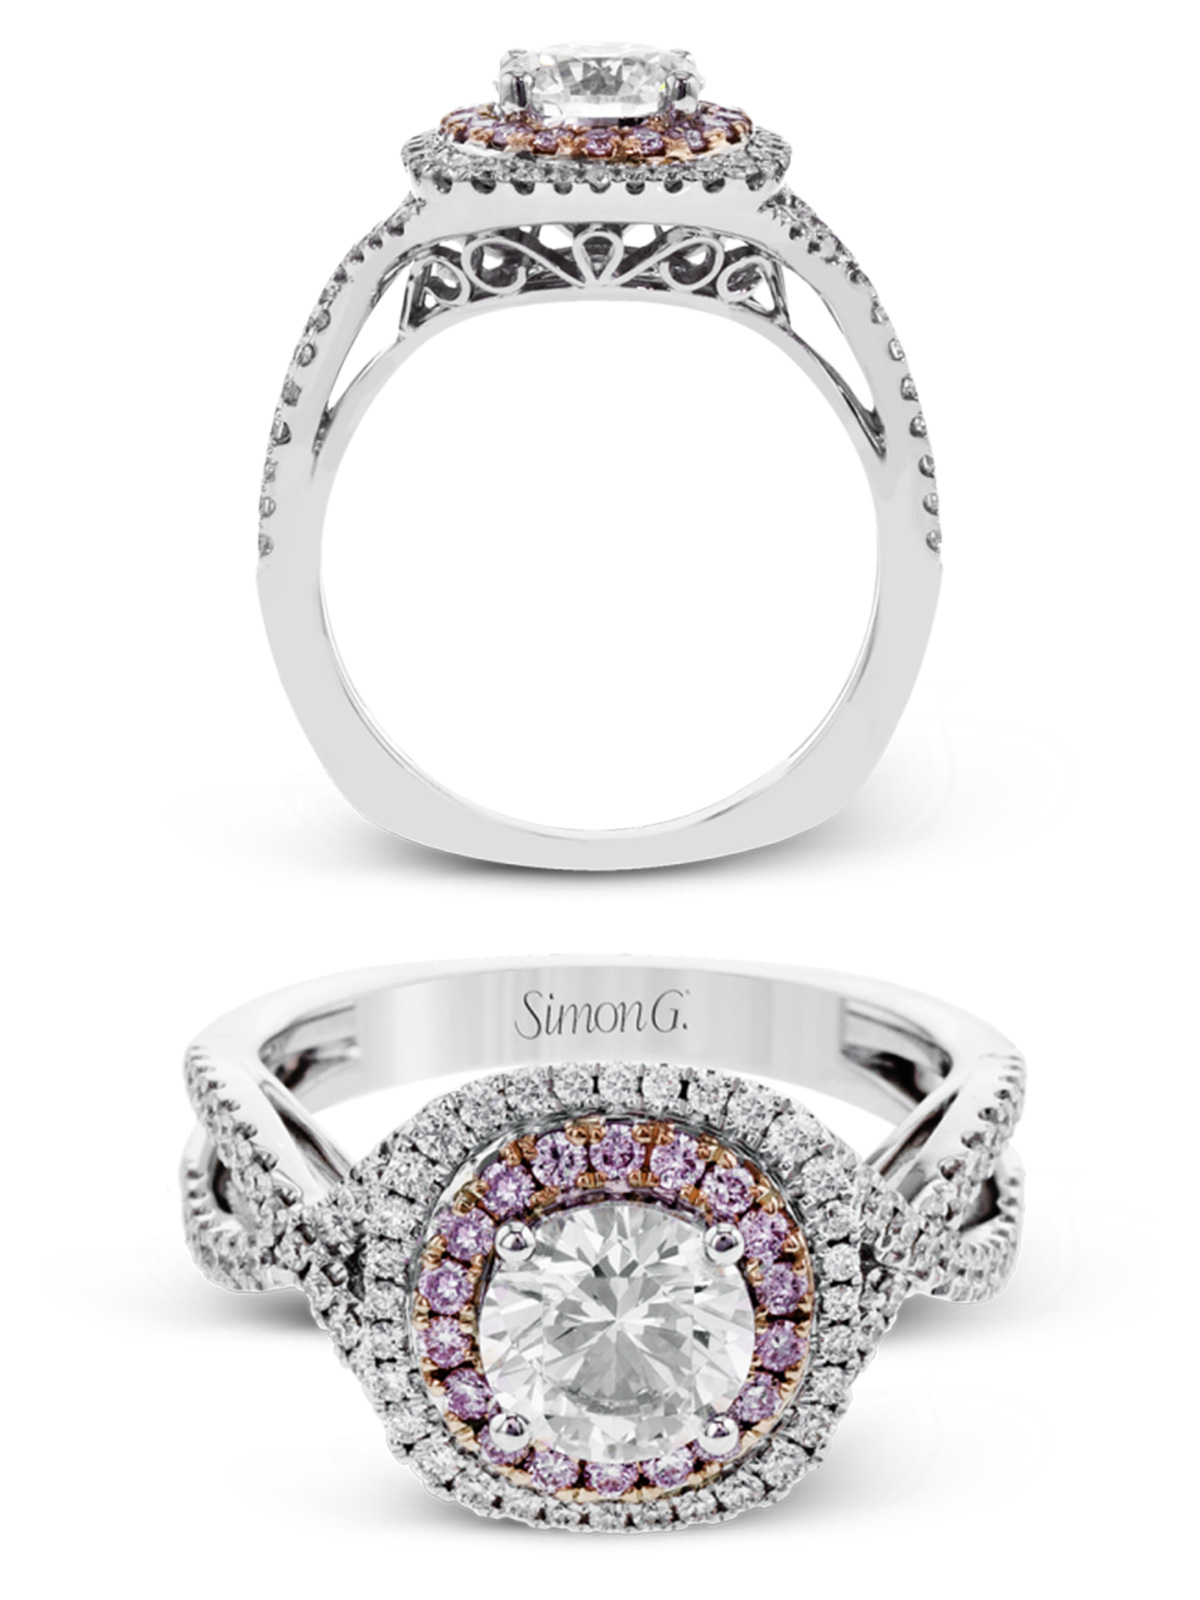 simon g jewelry 2017 trends diamond engagement ring mr2736 white gold rose gold pink diamonds halo ring